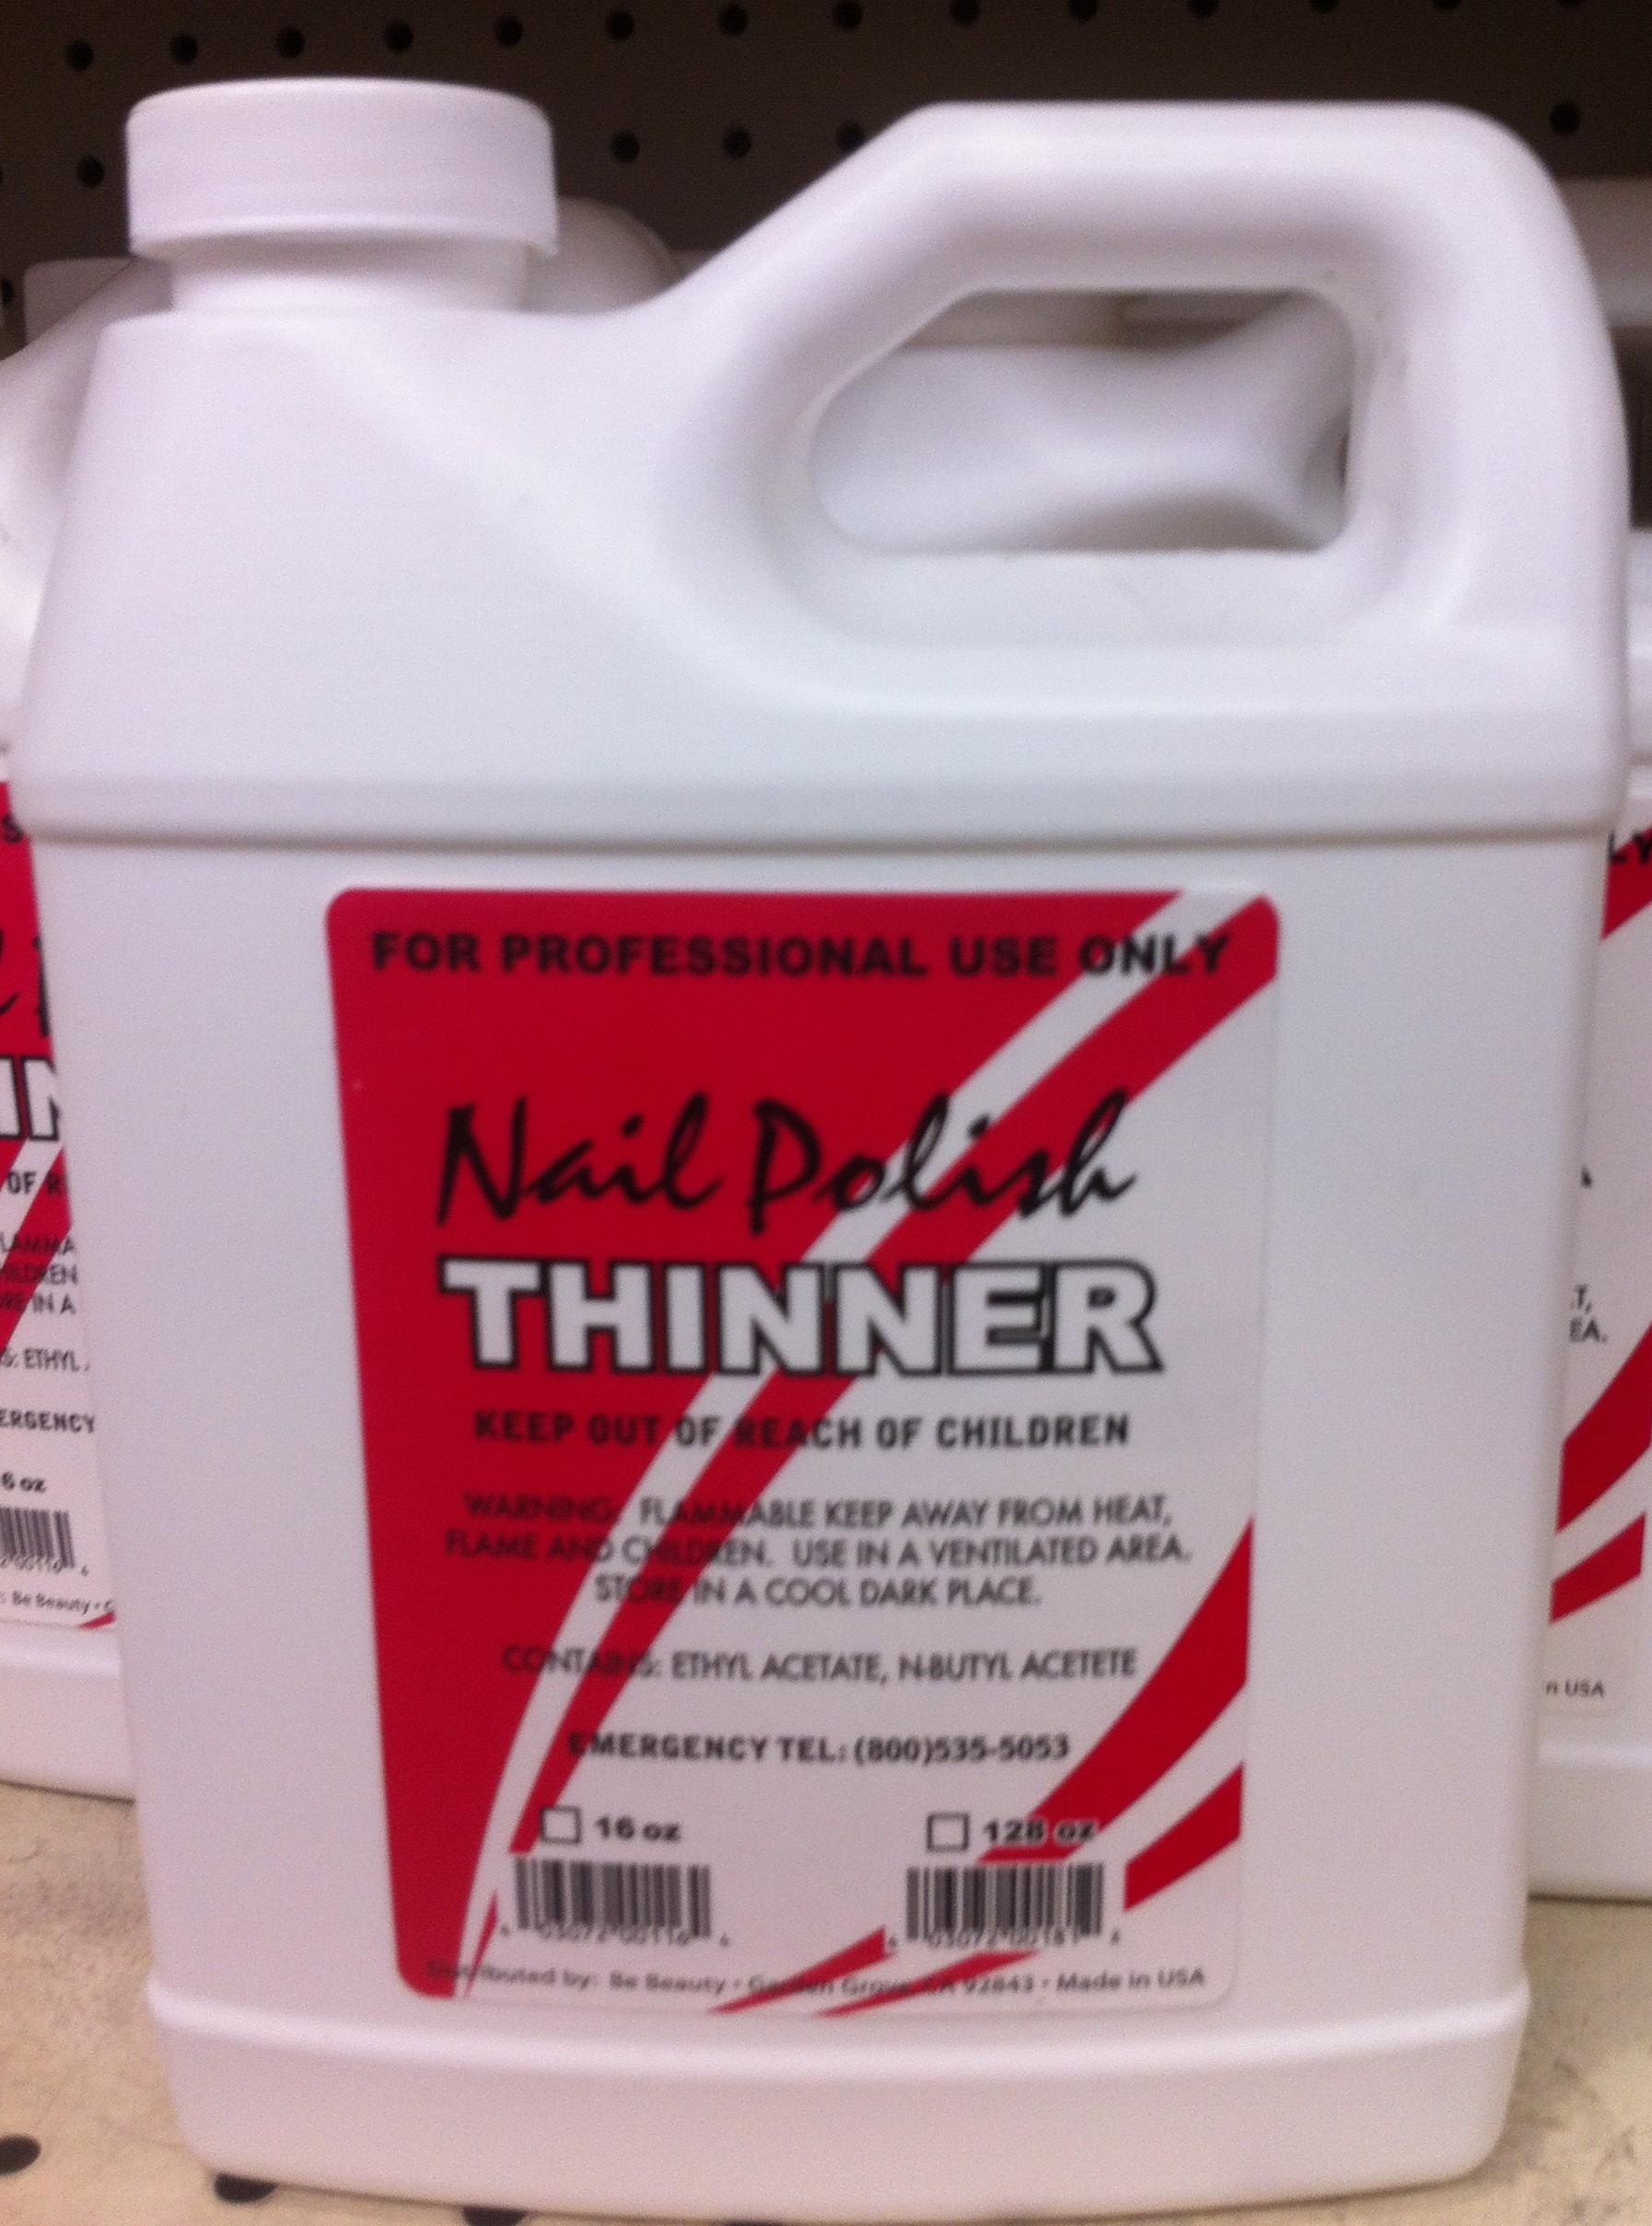 Polish Thinner